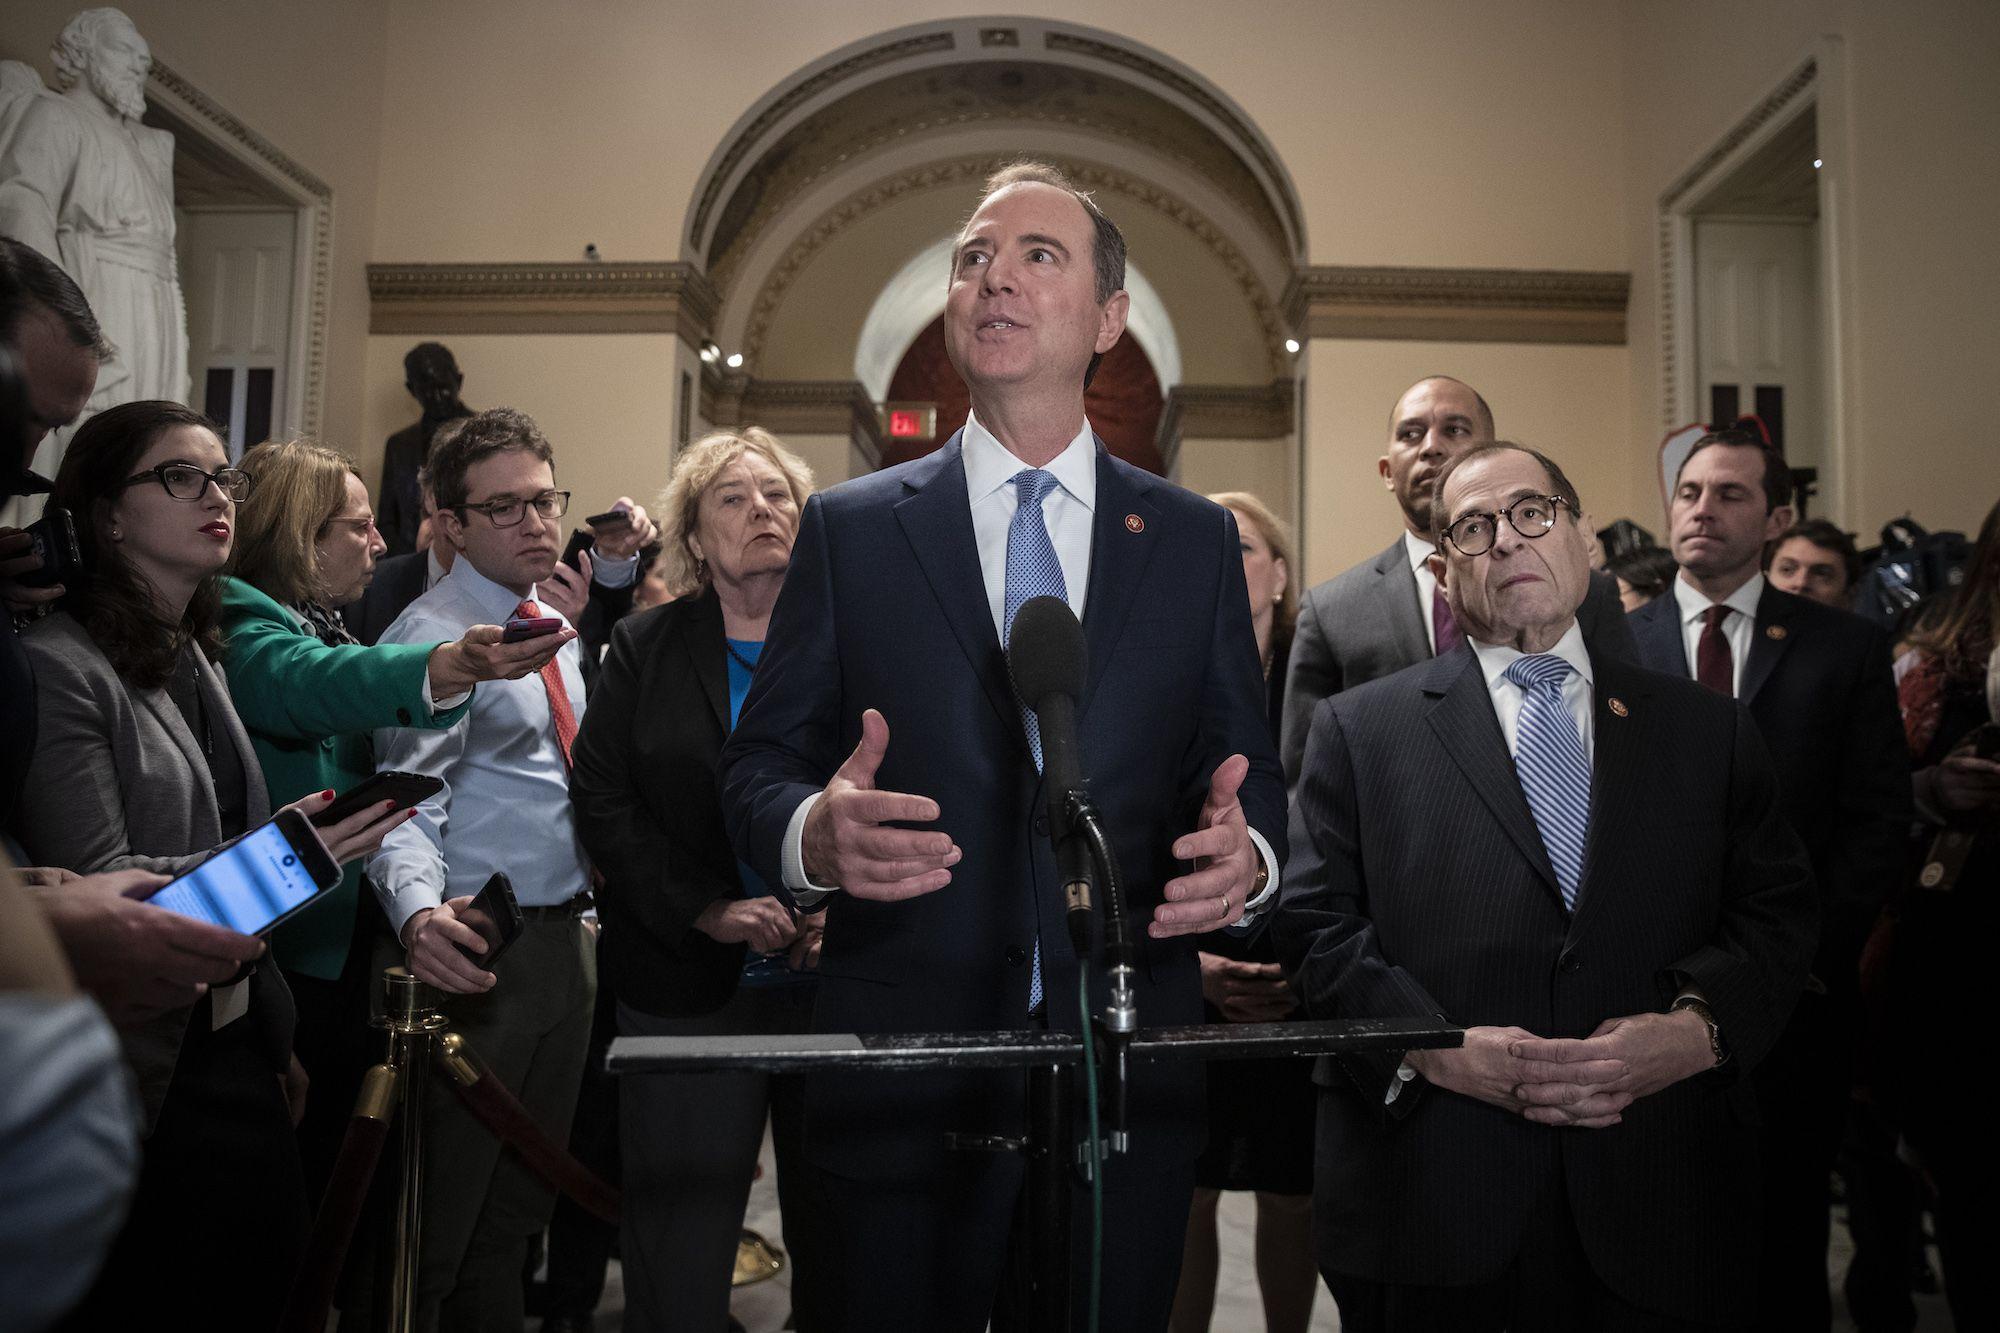 Adam Schiff Just Upped the Historical Ante at the Senate Impeachment Trial